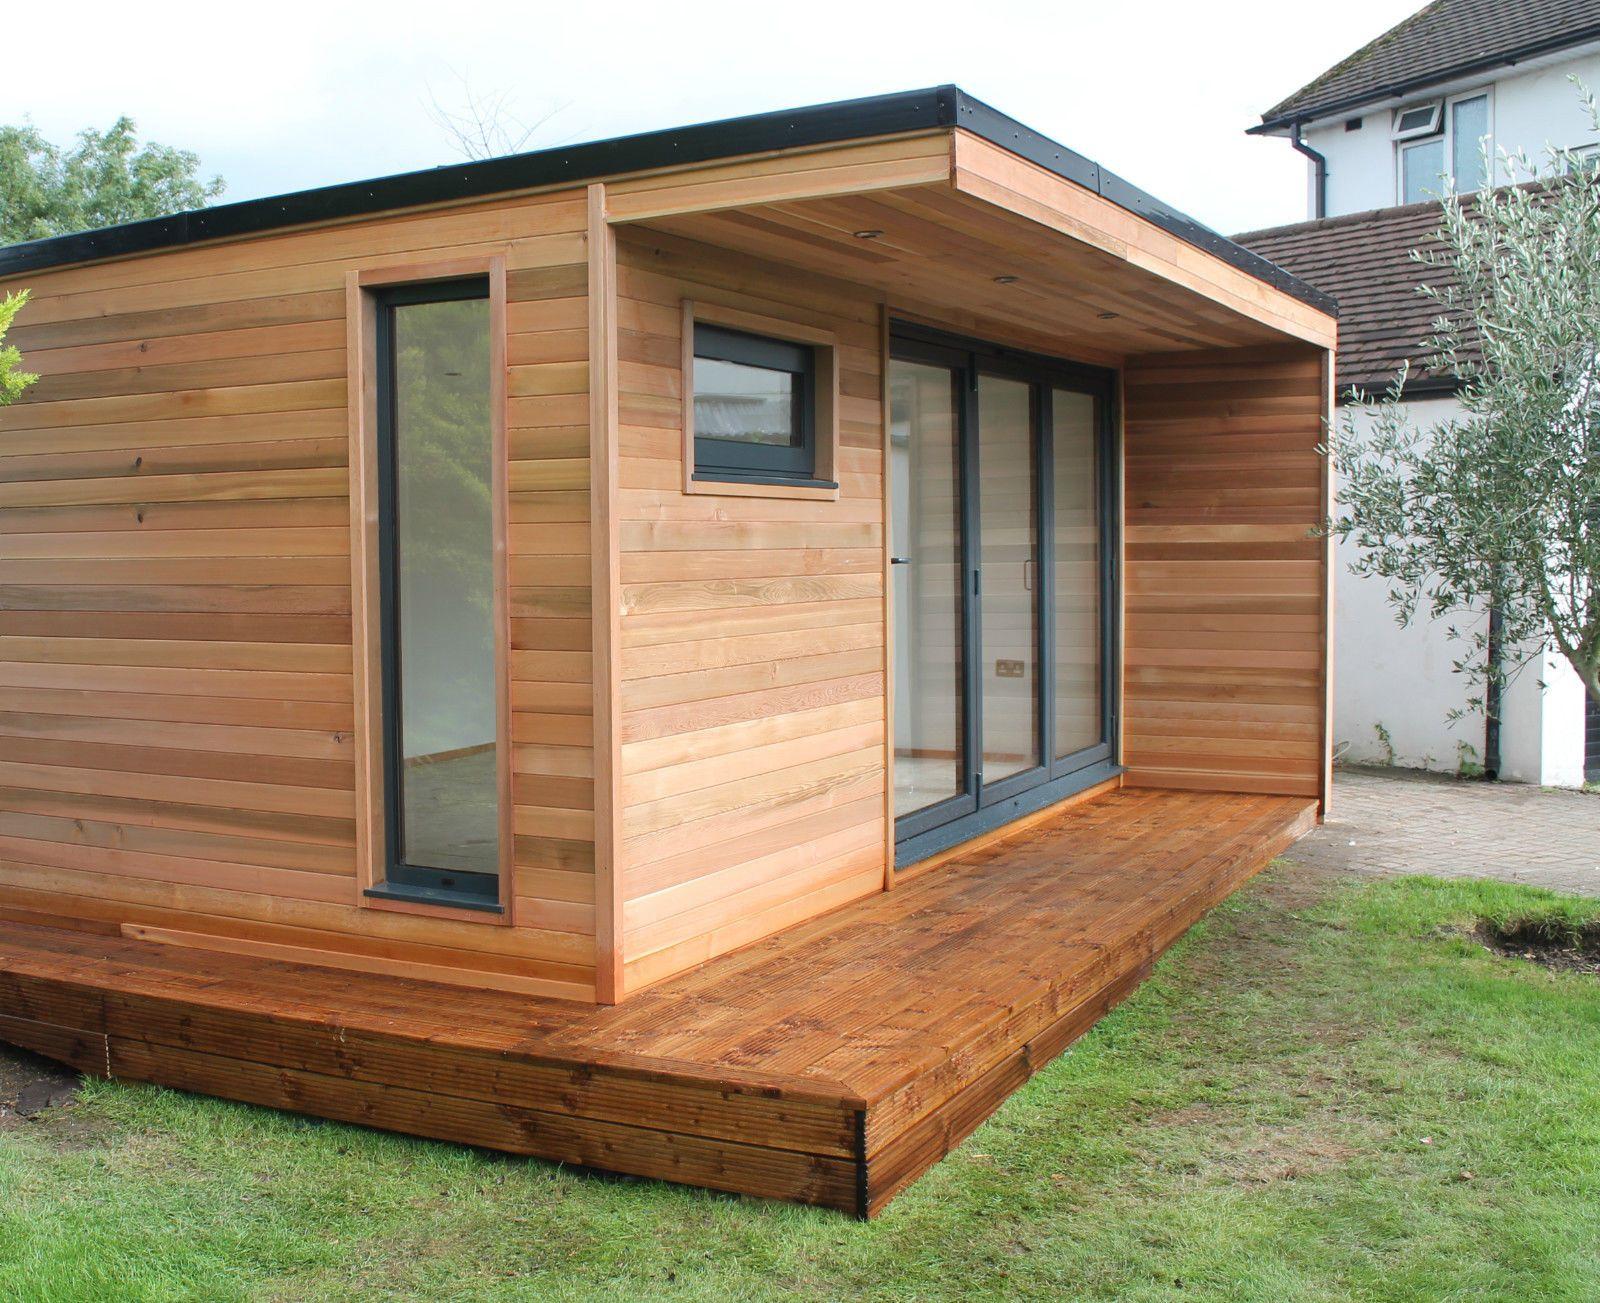 Chalet Nursery And Garden Center: 5m X 3m Garden Room / Home Office / Studio / Summer House